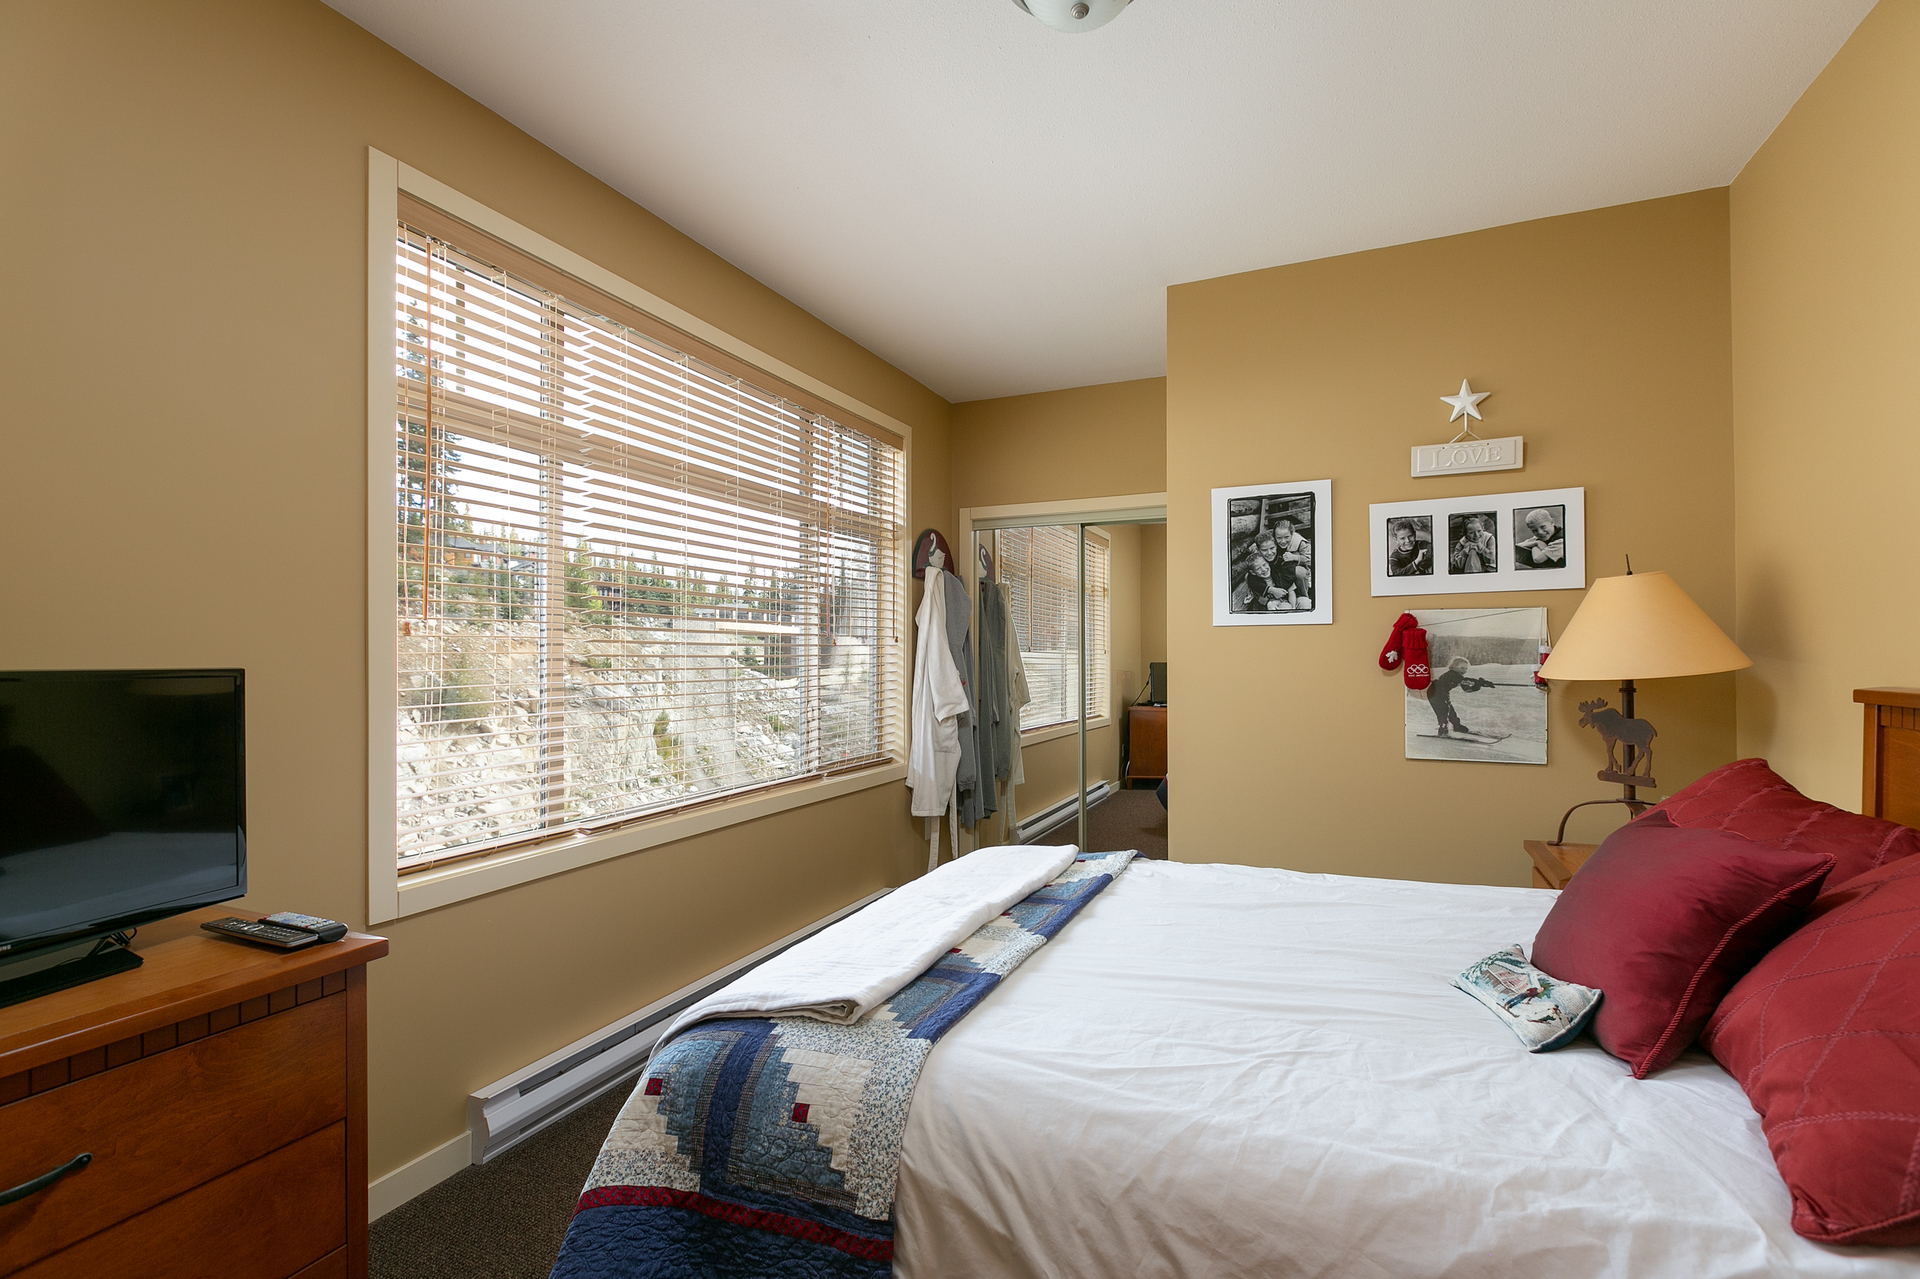 5d3_4107-edit at 301 - 255 Feathertop Way, Big White, Central Okanagan